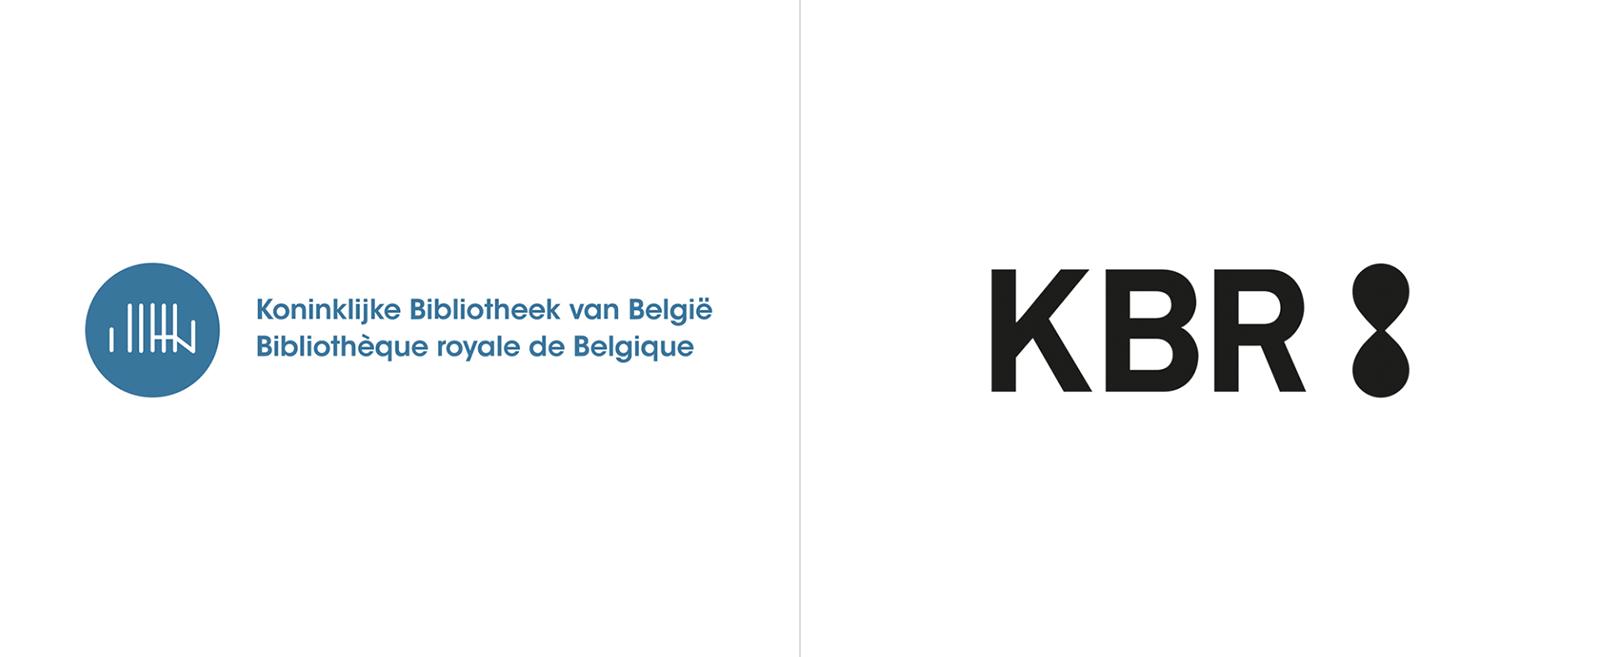 KBR比利时皇家图书馆启用全新的品牌VI形象设计-深圳VI设计1